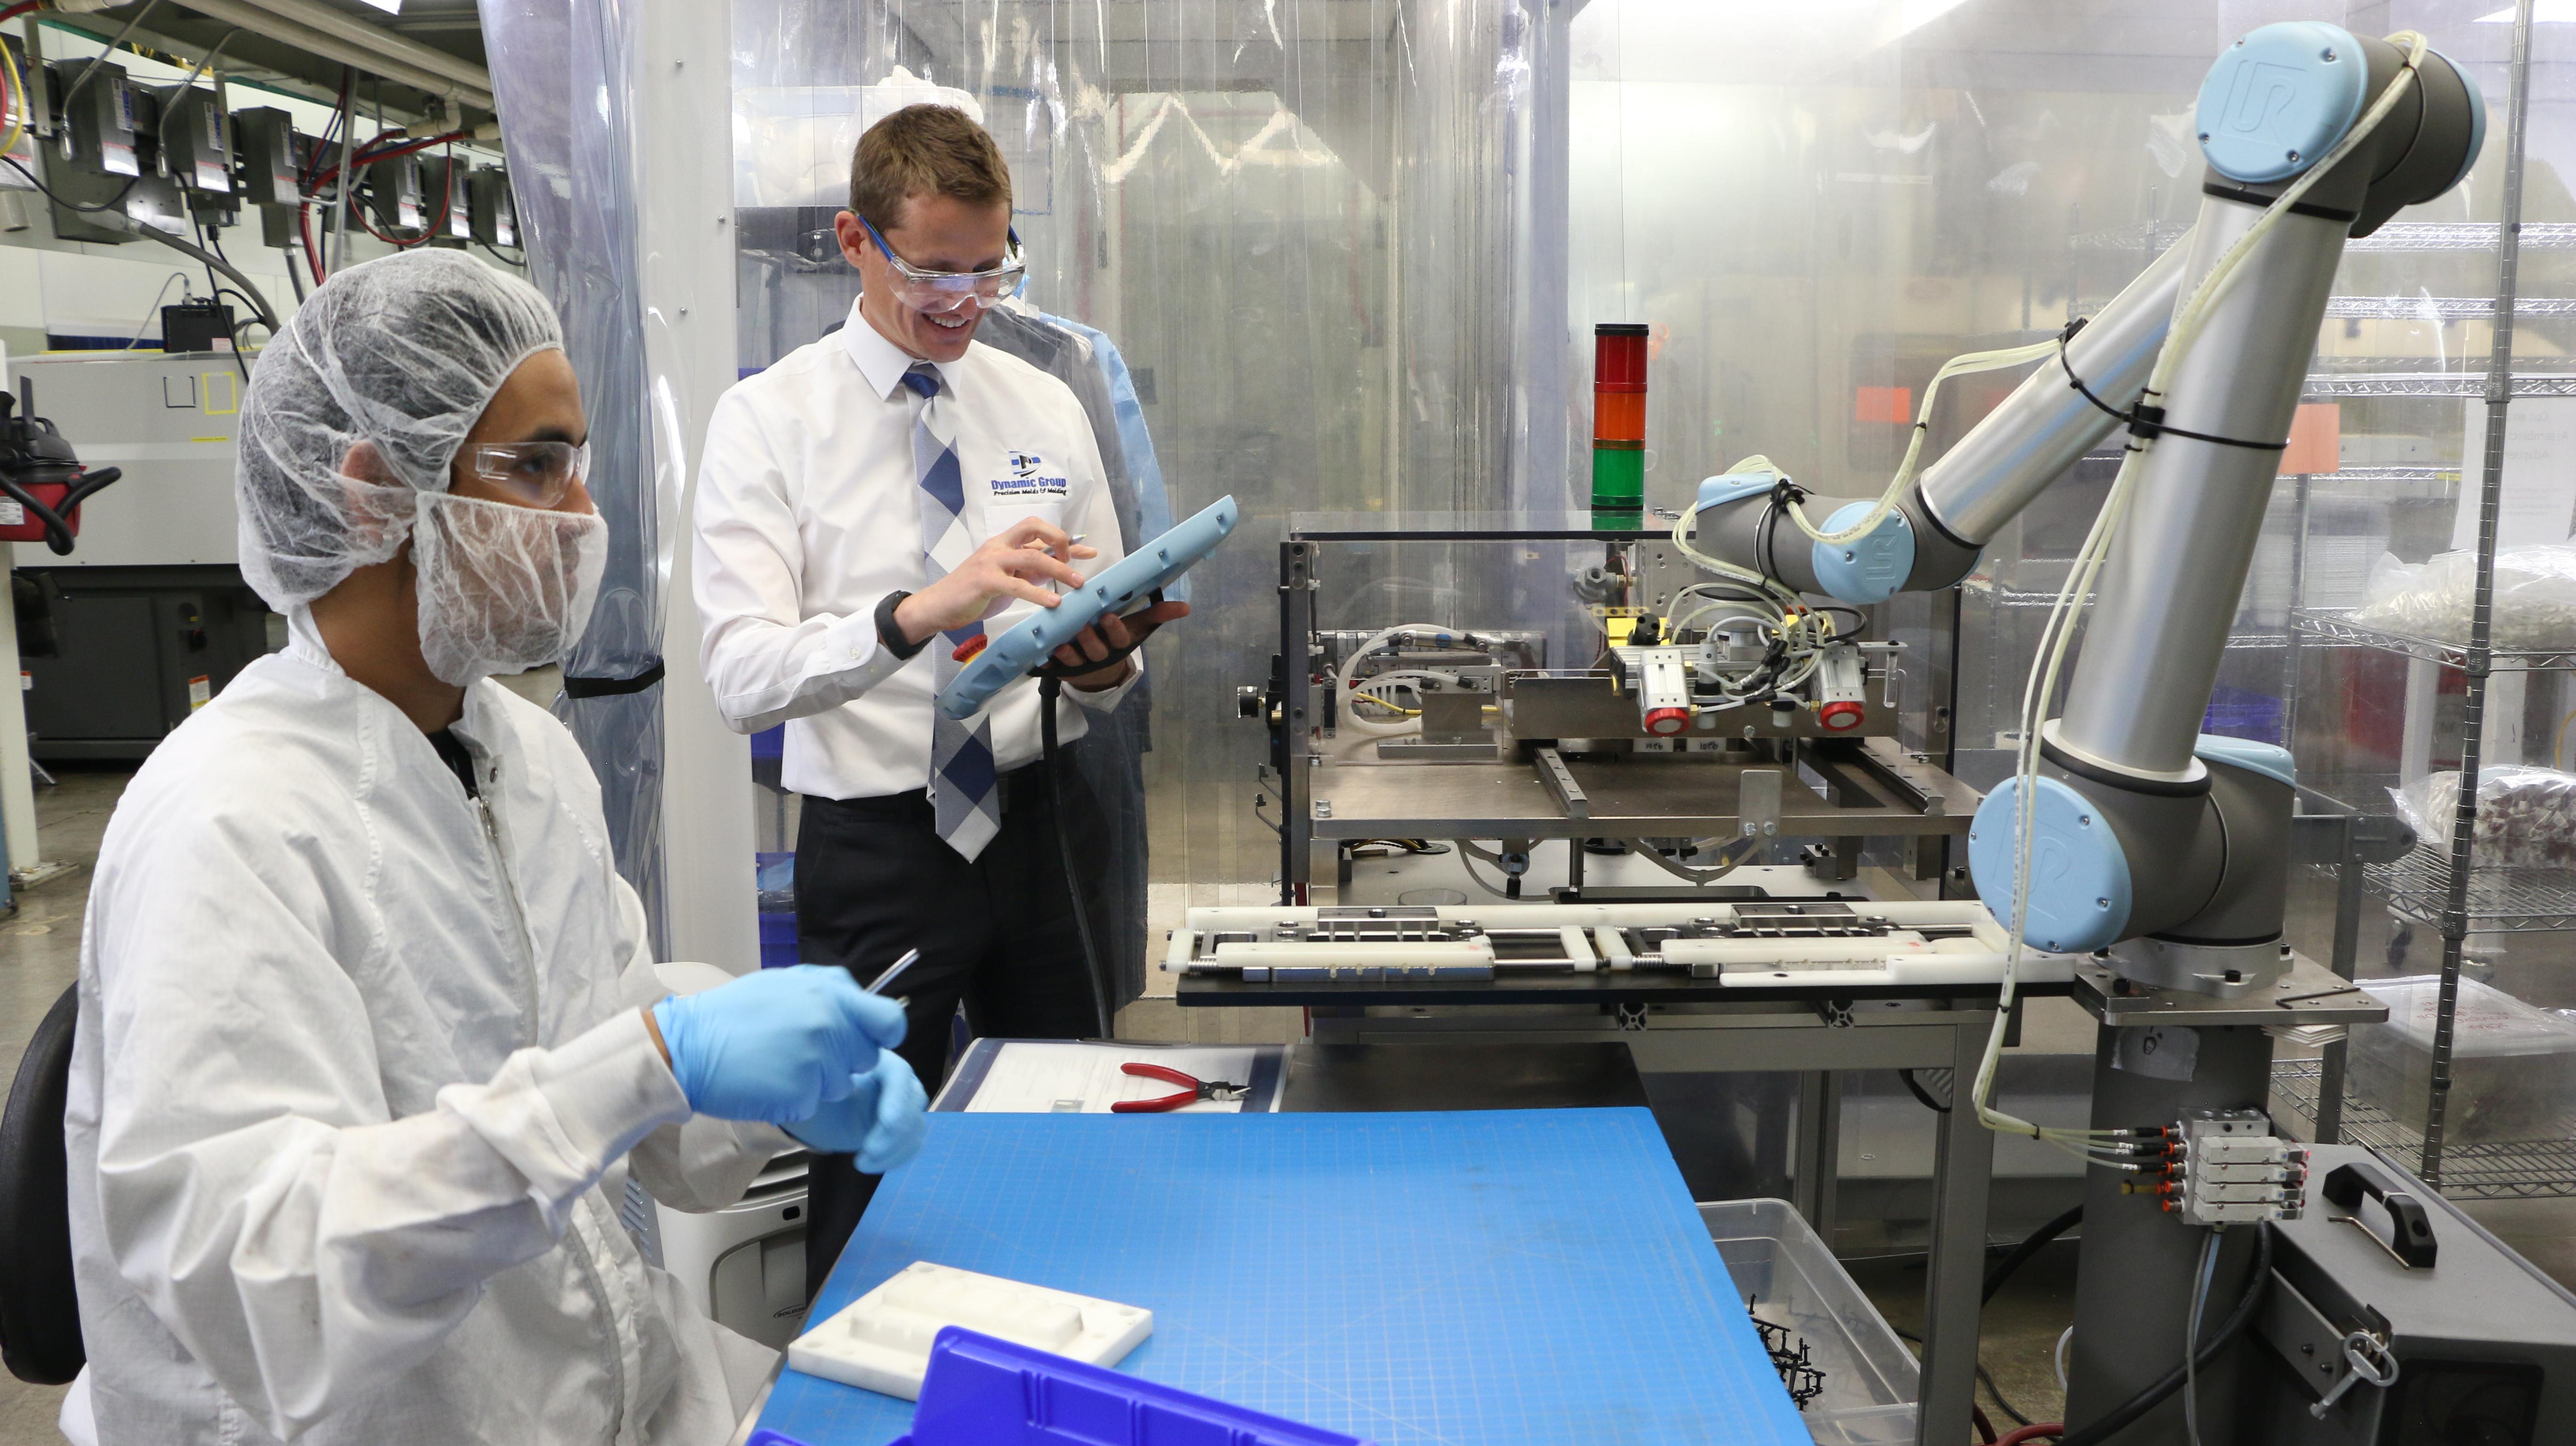 analyse risques robotique collaborative